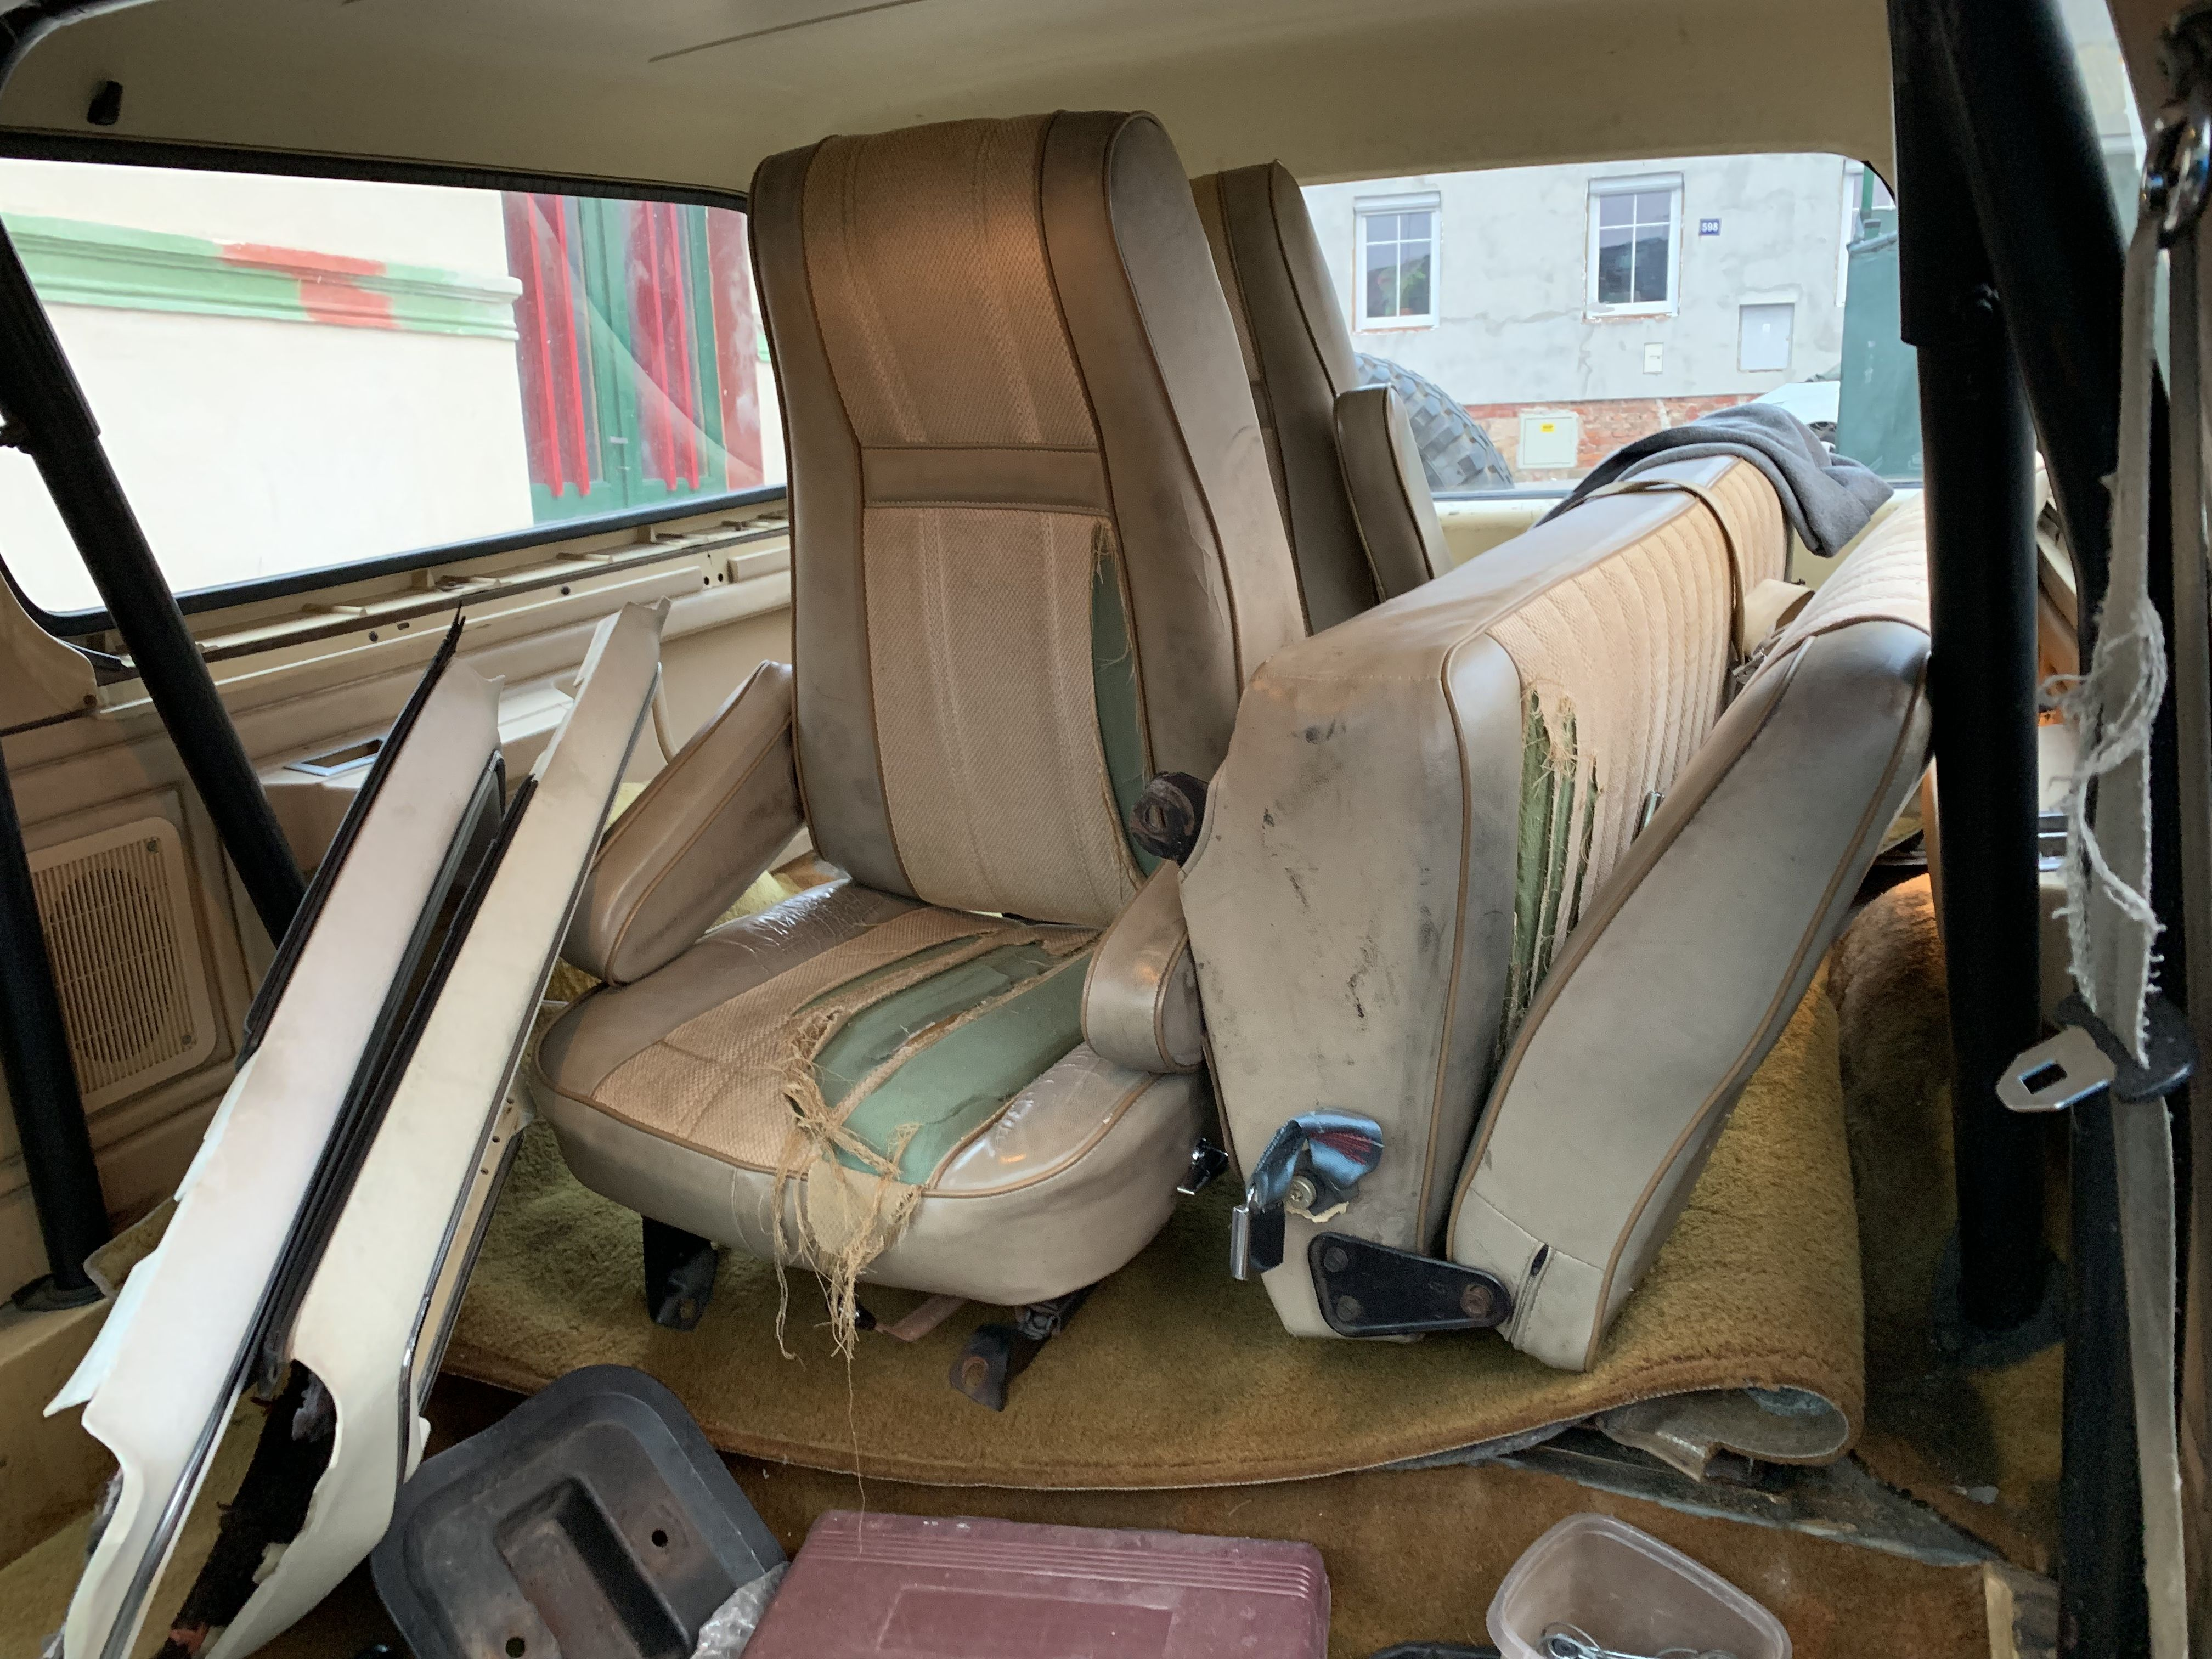 Ford Bronco 1980 interior before renovation